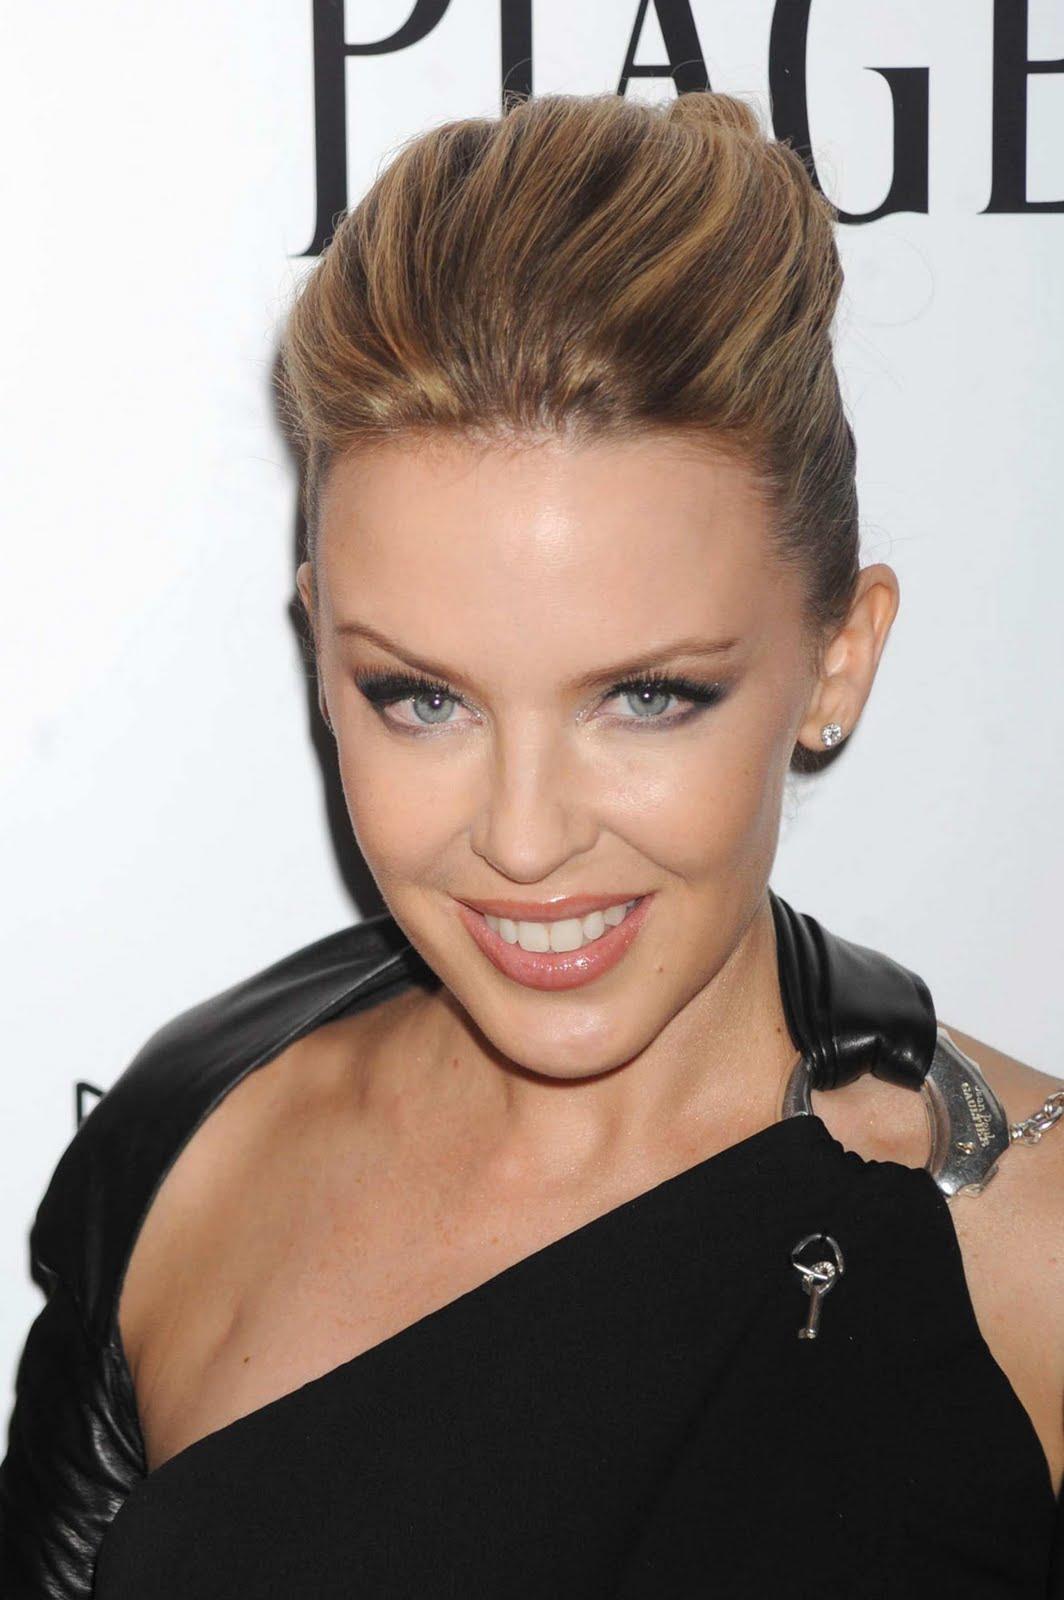 http://1.bp.blogspot.com/_WZUKutdVIrw/TGyjEPWukkI/AAAAAAAADEc/D8GMYWPAYBY/s1600/Kylie+Minogue+a84_032.jpg